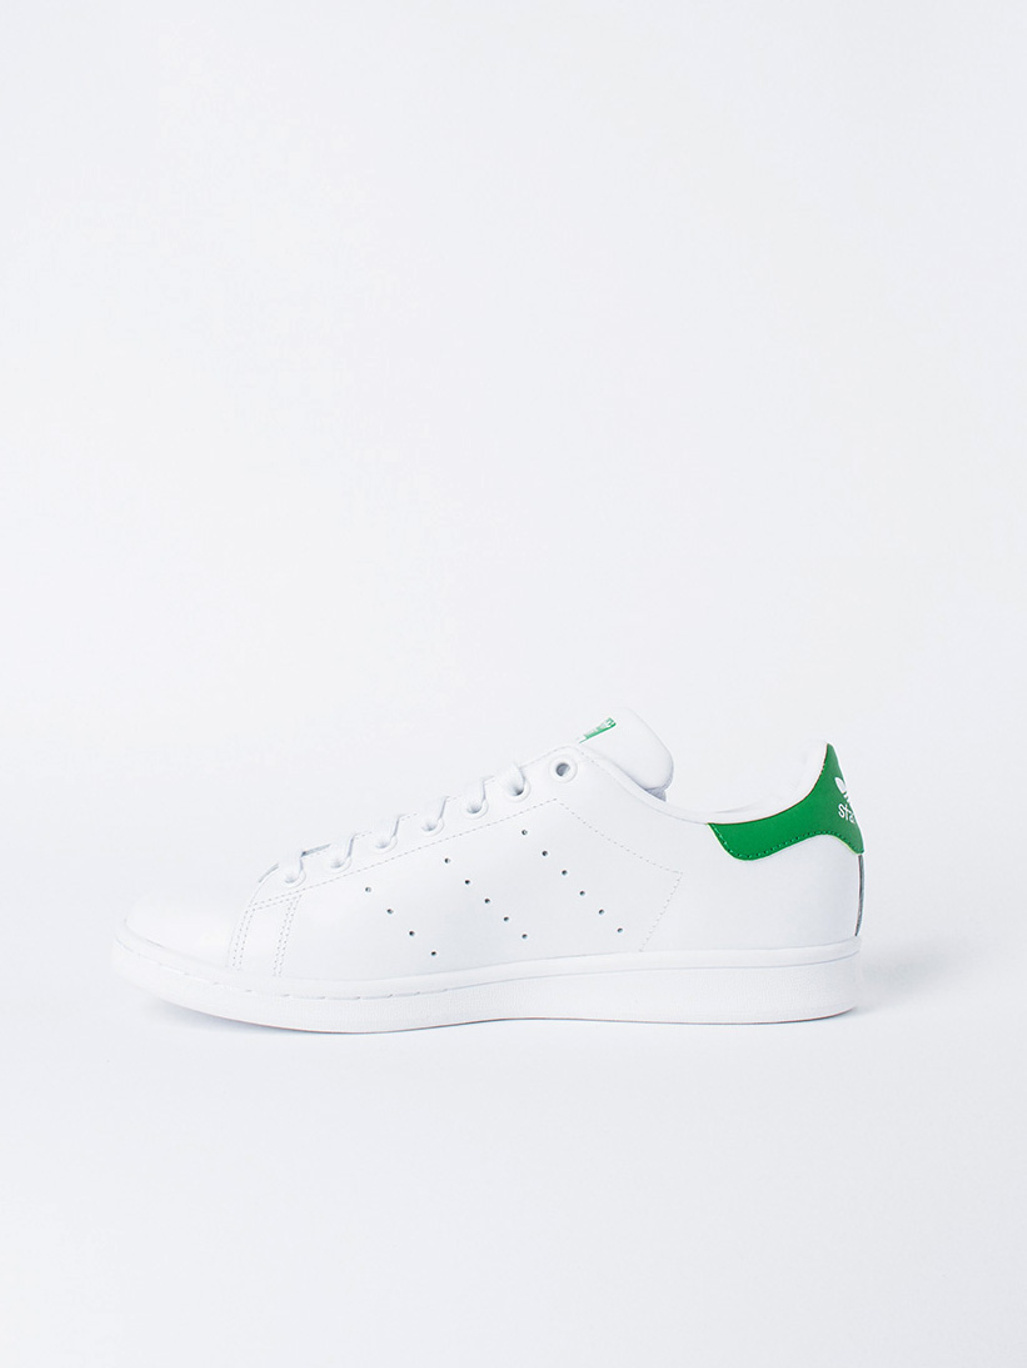 brand new 8d37f bae4f Adidas Originals Stan Smith WhiteGreen